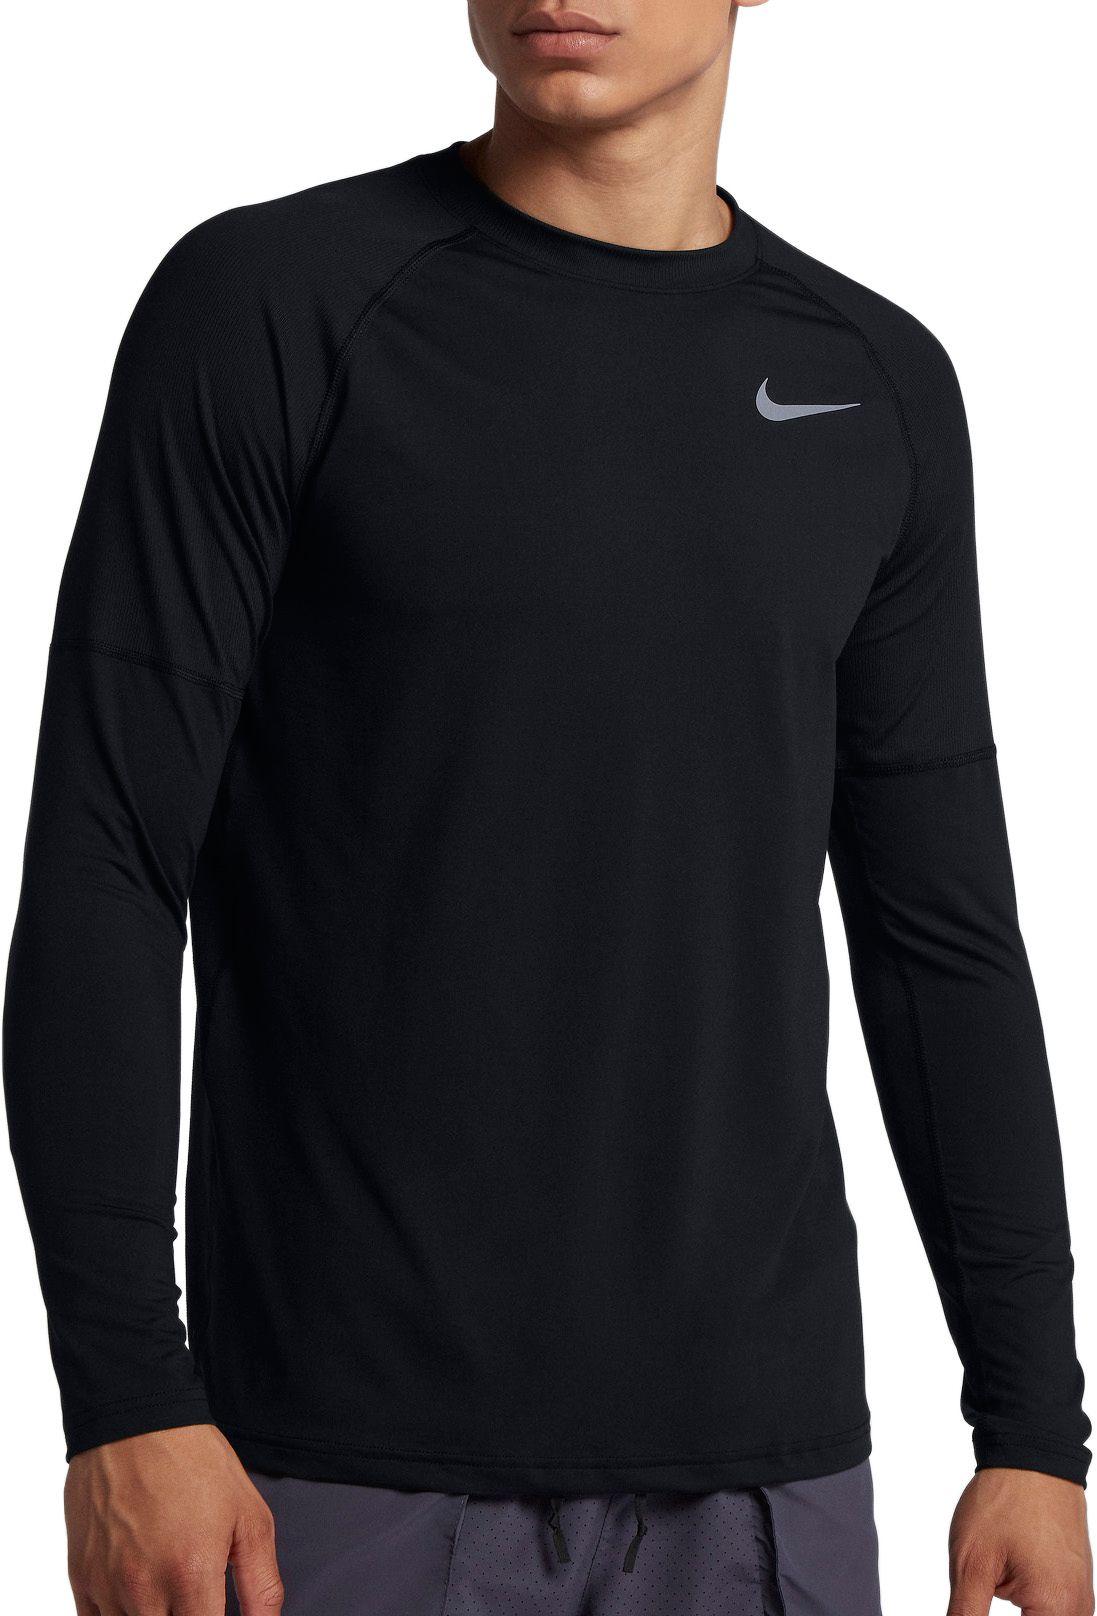 4b25490d Nike Men's Element Crew Running Long Sleeve Tee, Size: Small, Black ...